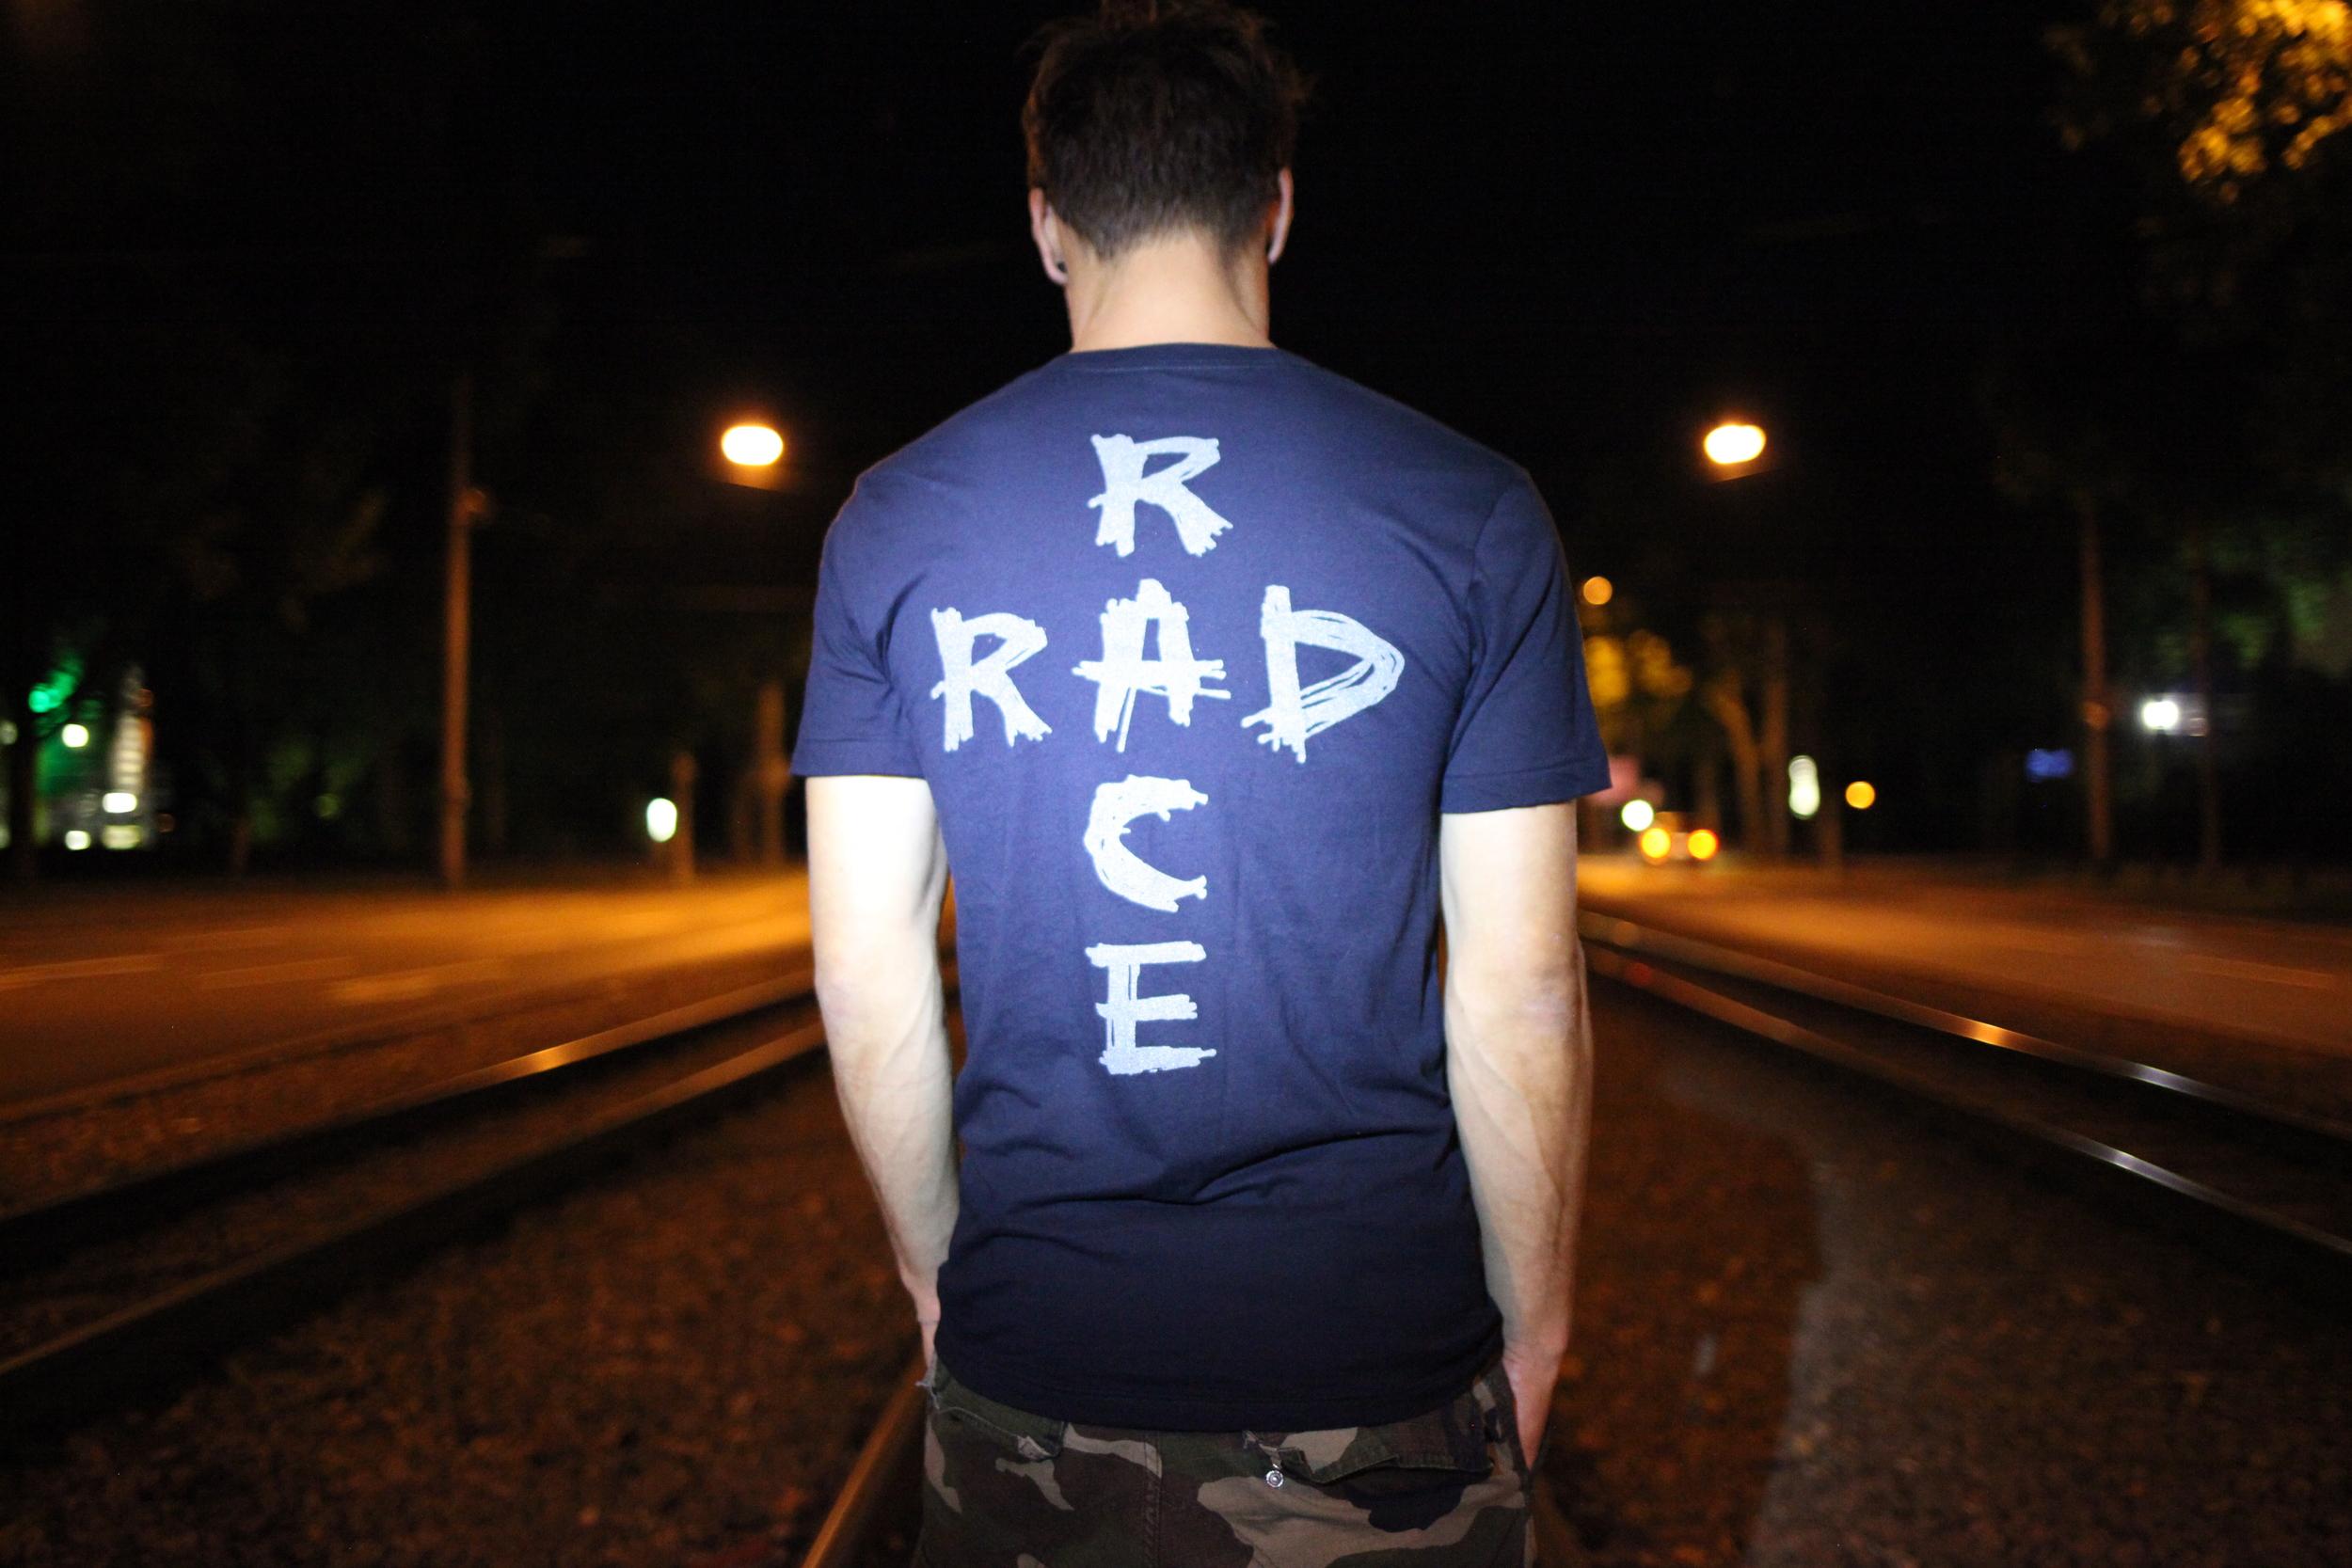 RAD RACE Black Reflective Shirt